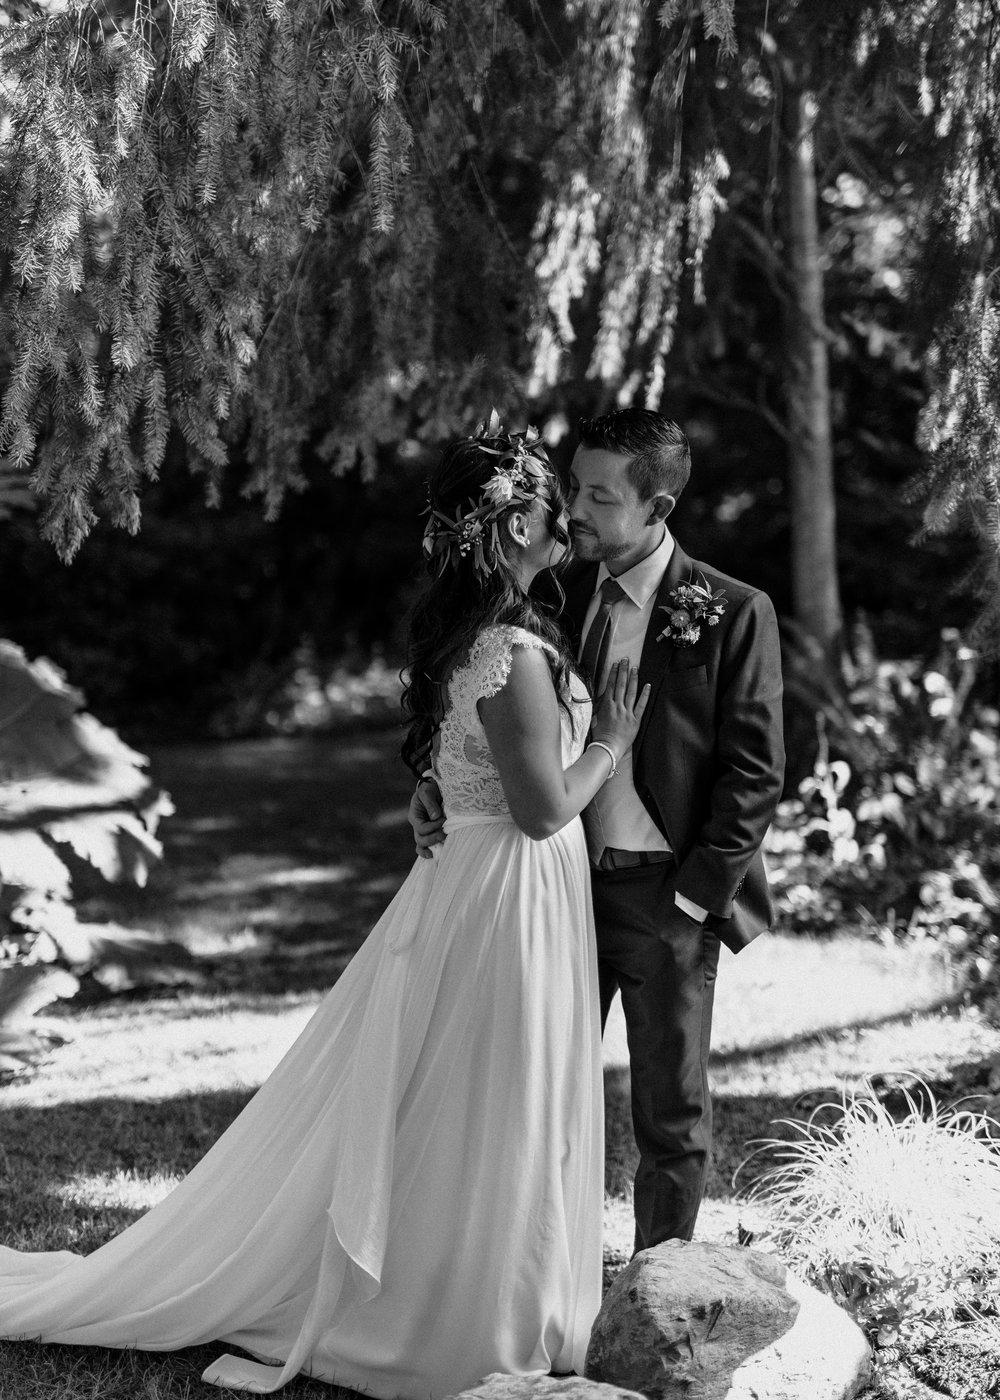 herafilms_wedding_jessica_kyle_hera_selects-29.jpg